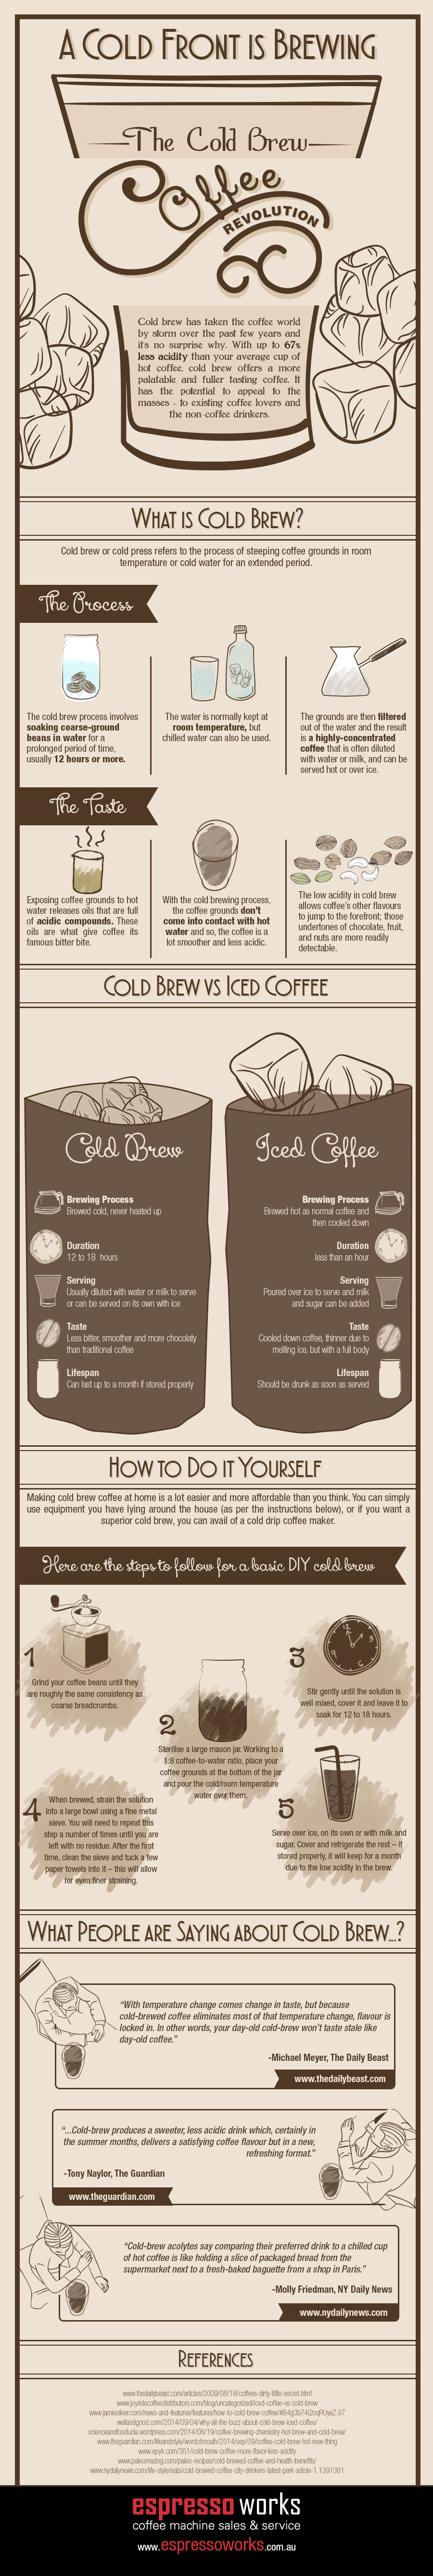 Cold-Brew-Coffee-Revolution-Infographic